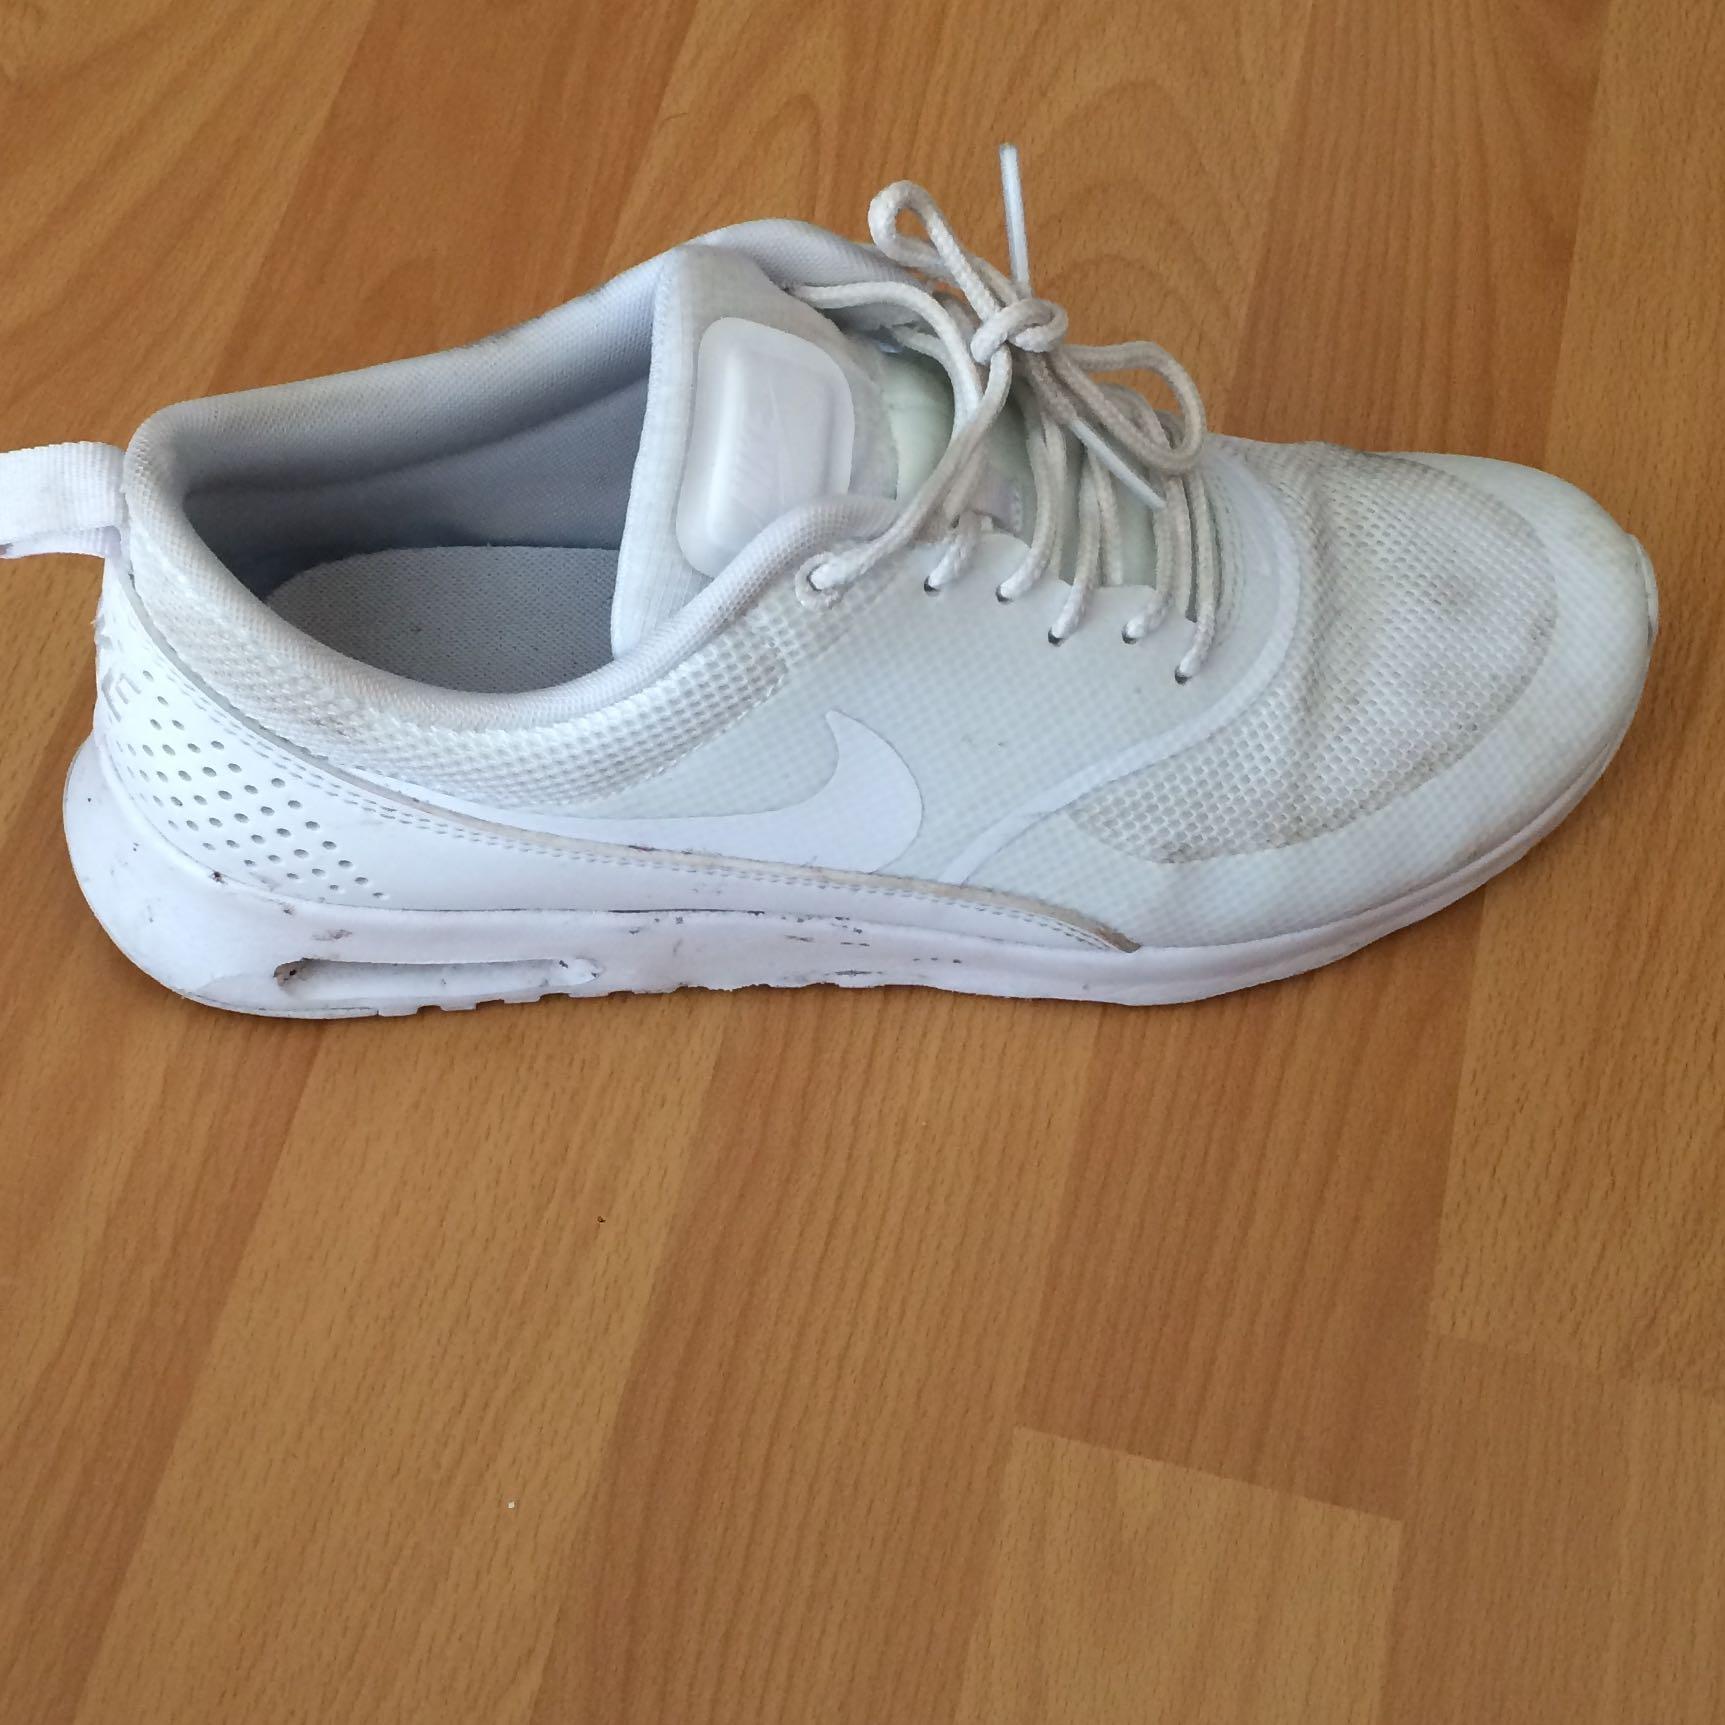 Nike Free Rn Flyknit Waschen